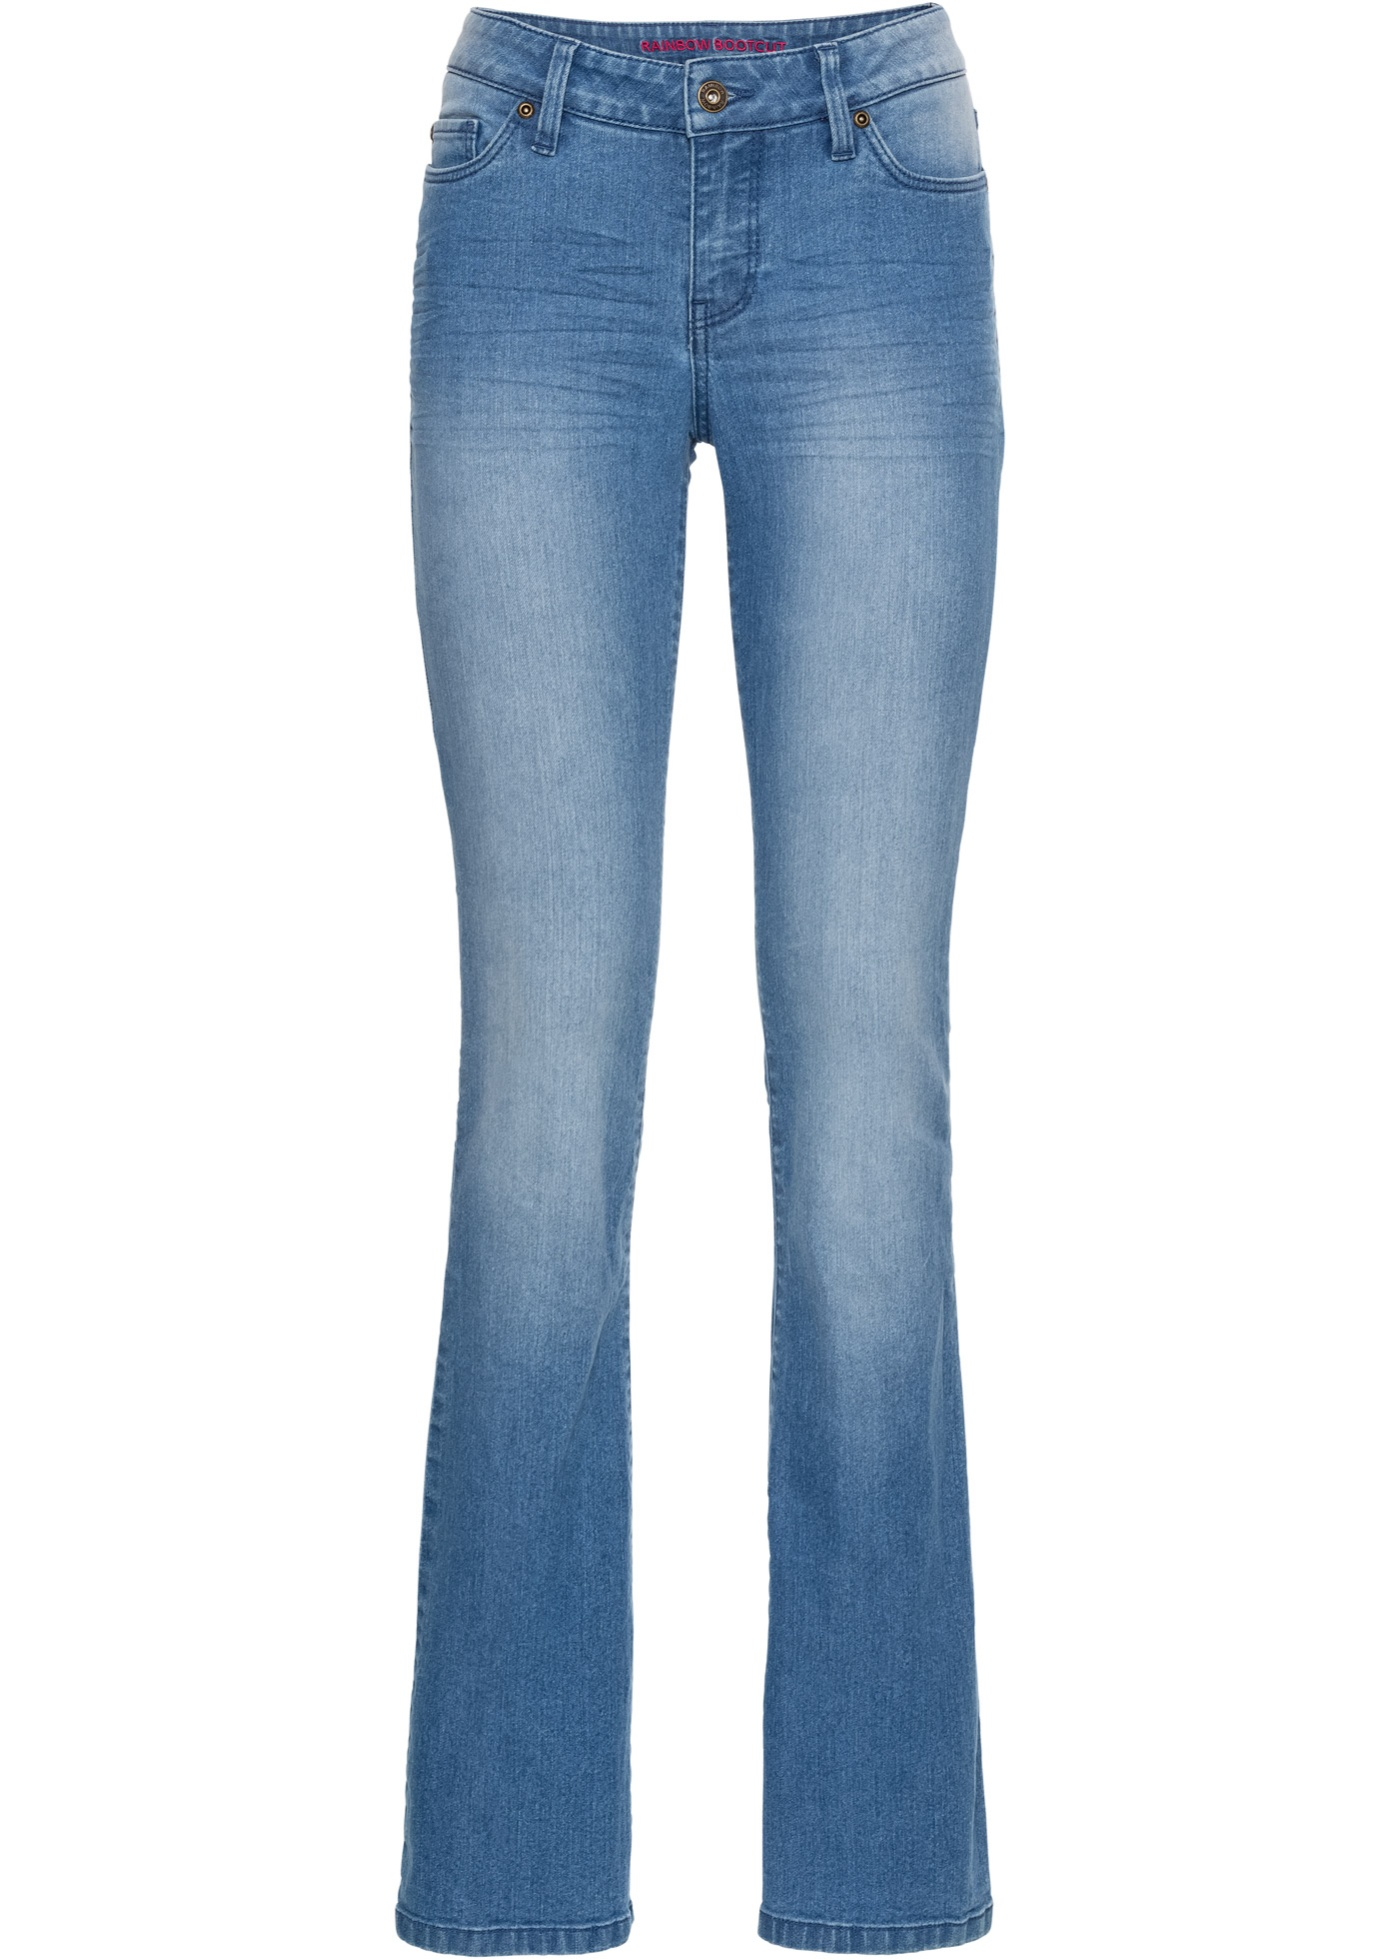 Rainbow BonprixJean Bleu Pour Femme Bootcut 0PXkN8nwO